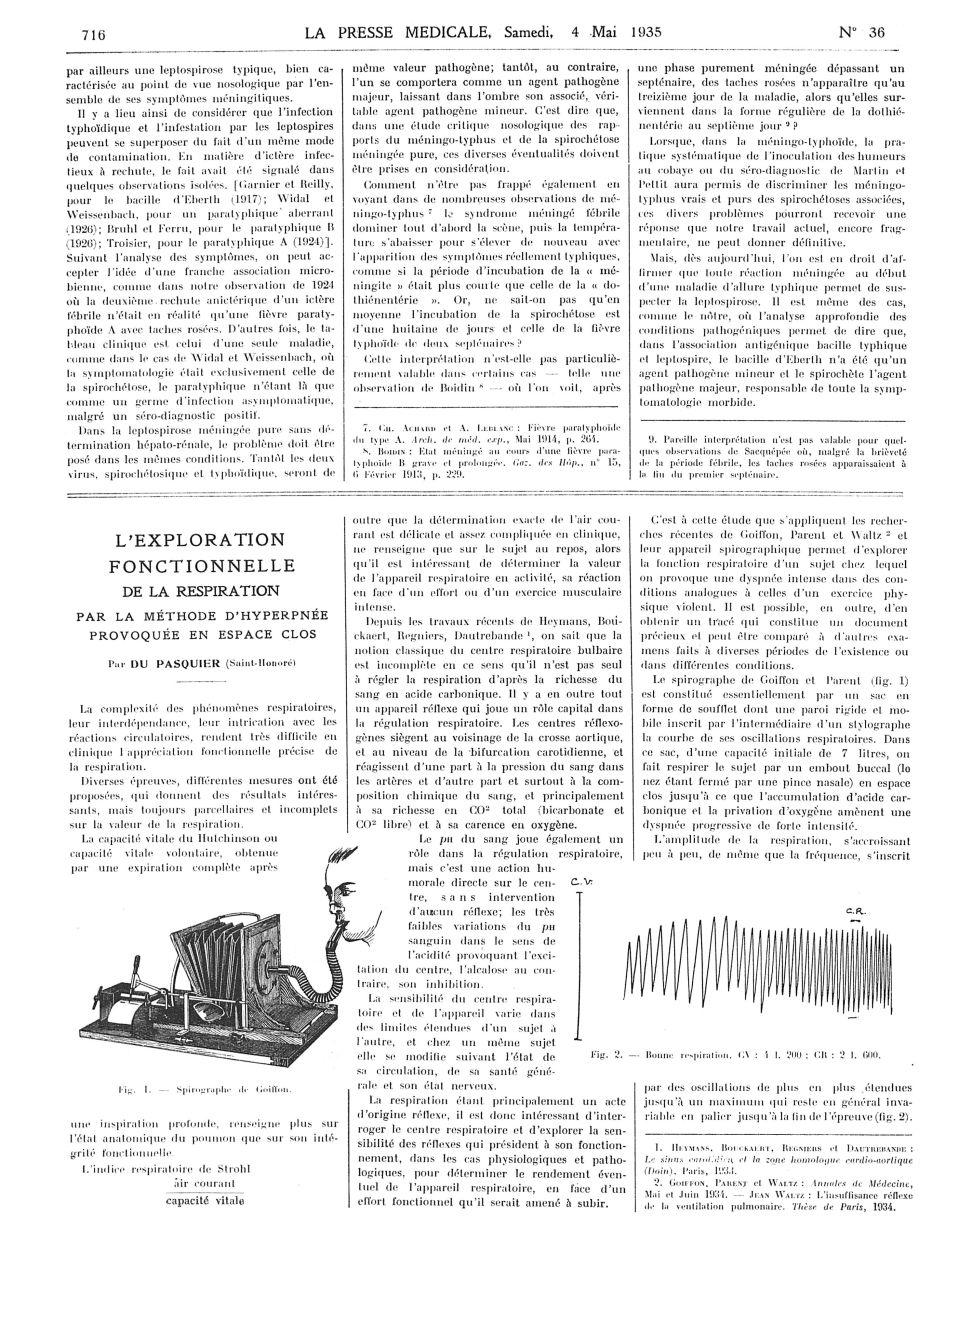 Fig. 1. Spirographe de Goiffon / Fig. 2. Bonne respiration. CV : 4 I. 200 ; CR : I. 600 -  - med100000x1935xartorigx0720